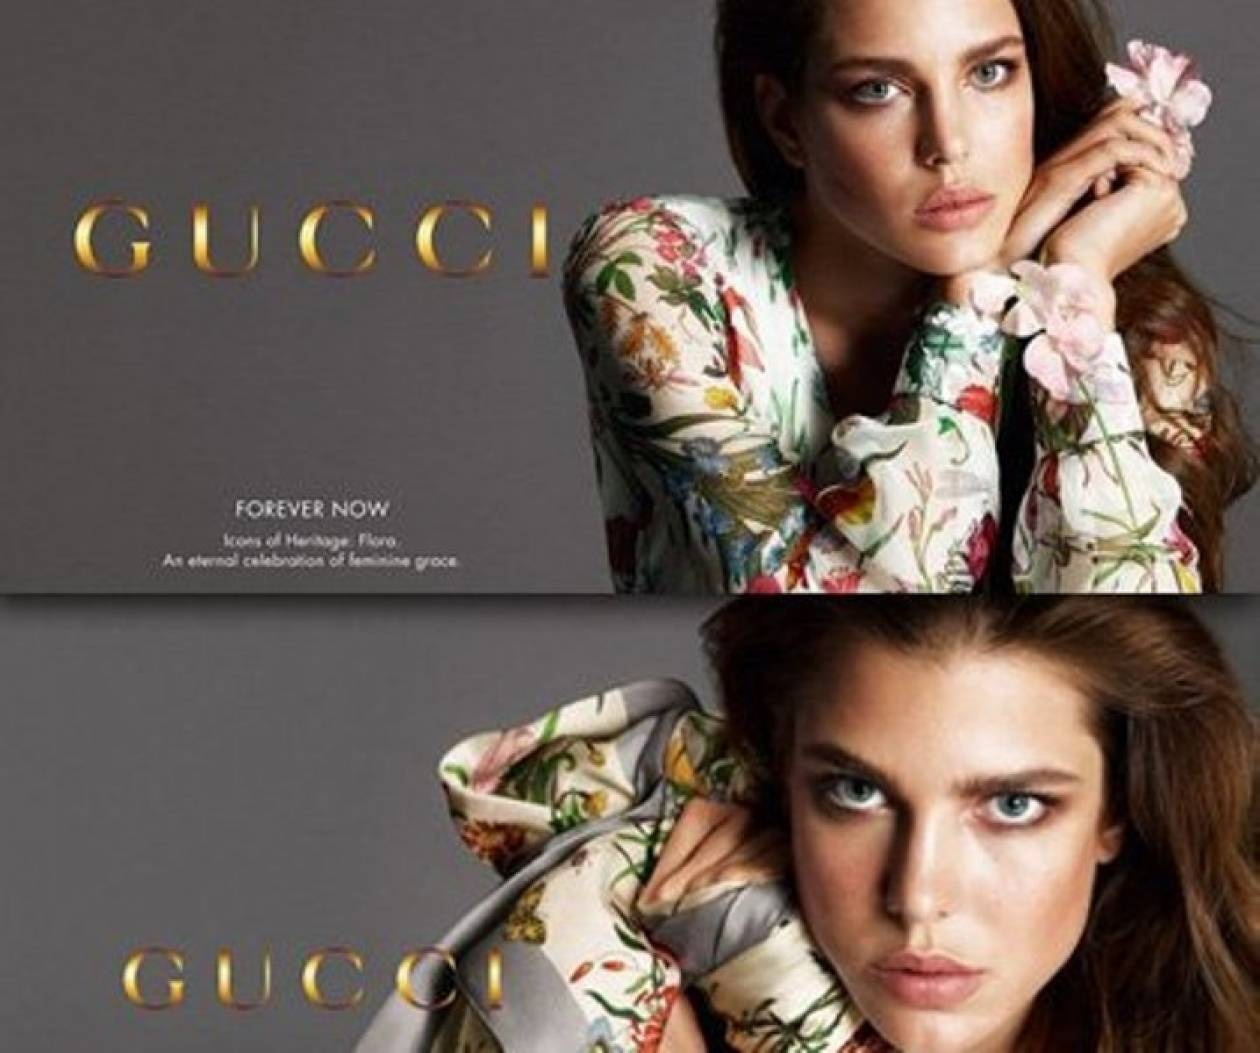 Charlotte Casiraghi: για τρίτη φορά σε καμπάνια του οίκου Gucci